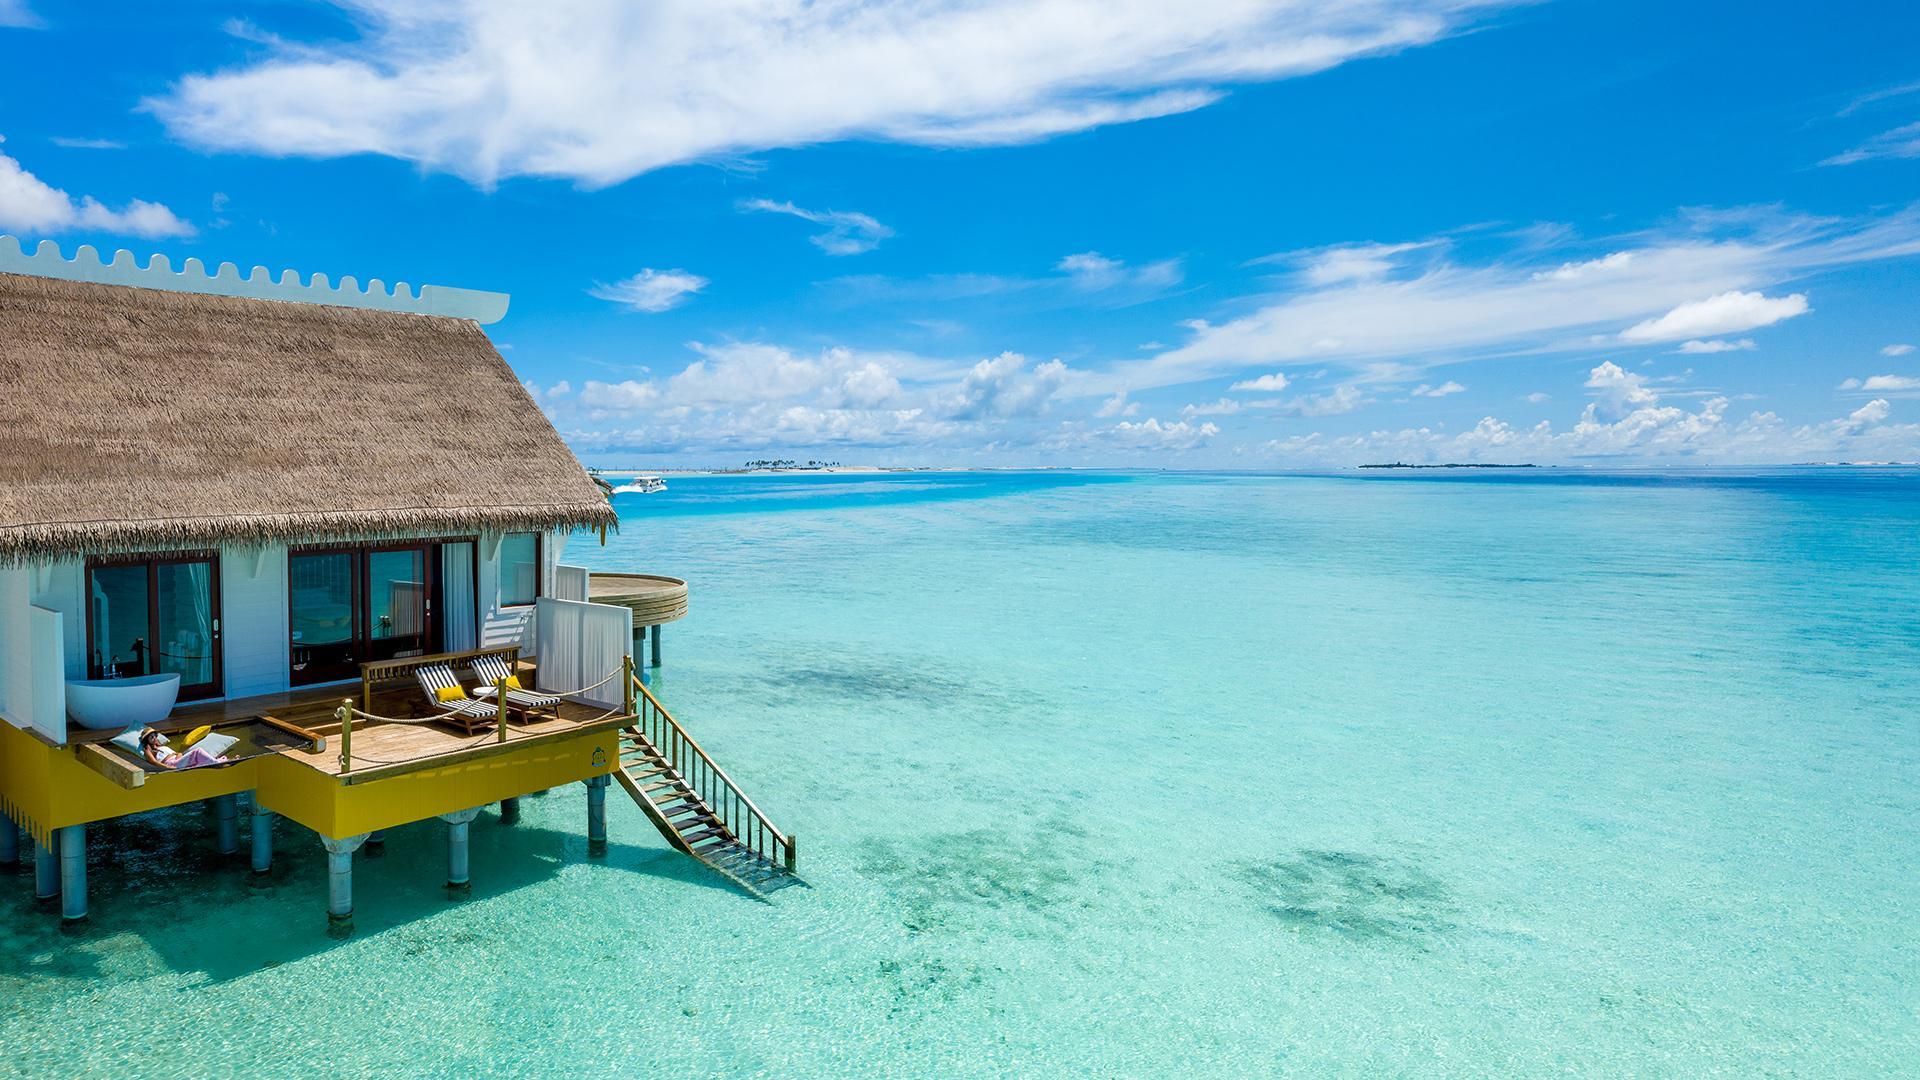 Overwater Villa  image 1 at SAii Lagoon Maldives, Curio Collection by Hilton by Kaafu Atoll, North Central Province, Maldives